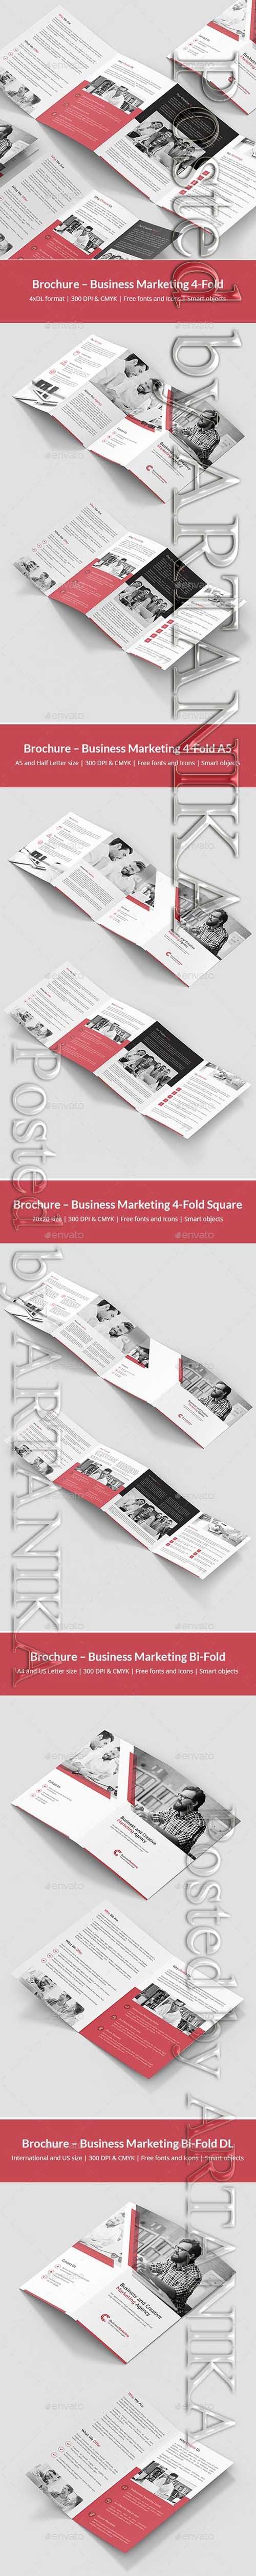 Business Marketing – Brochures Bundle Print Templates 10 in 1 21522205